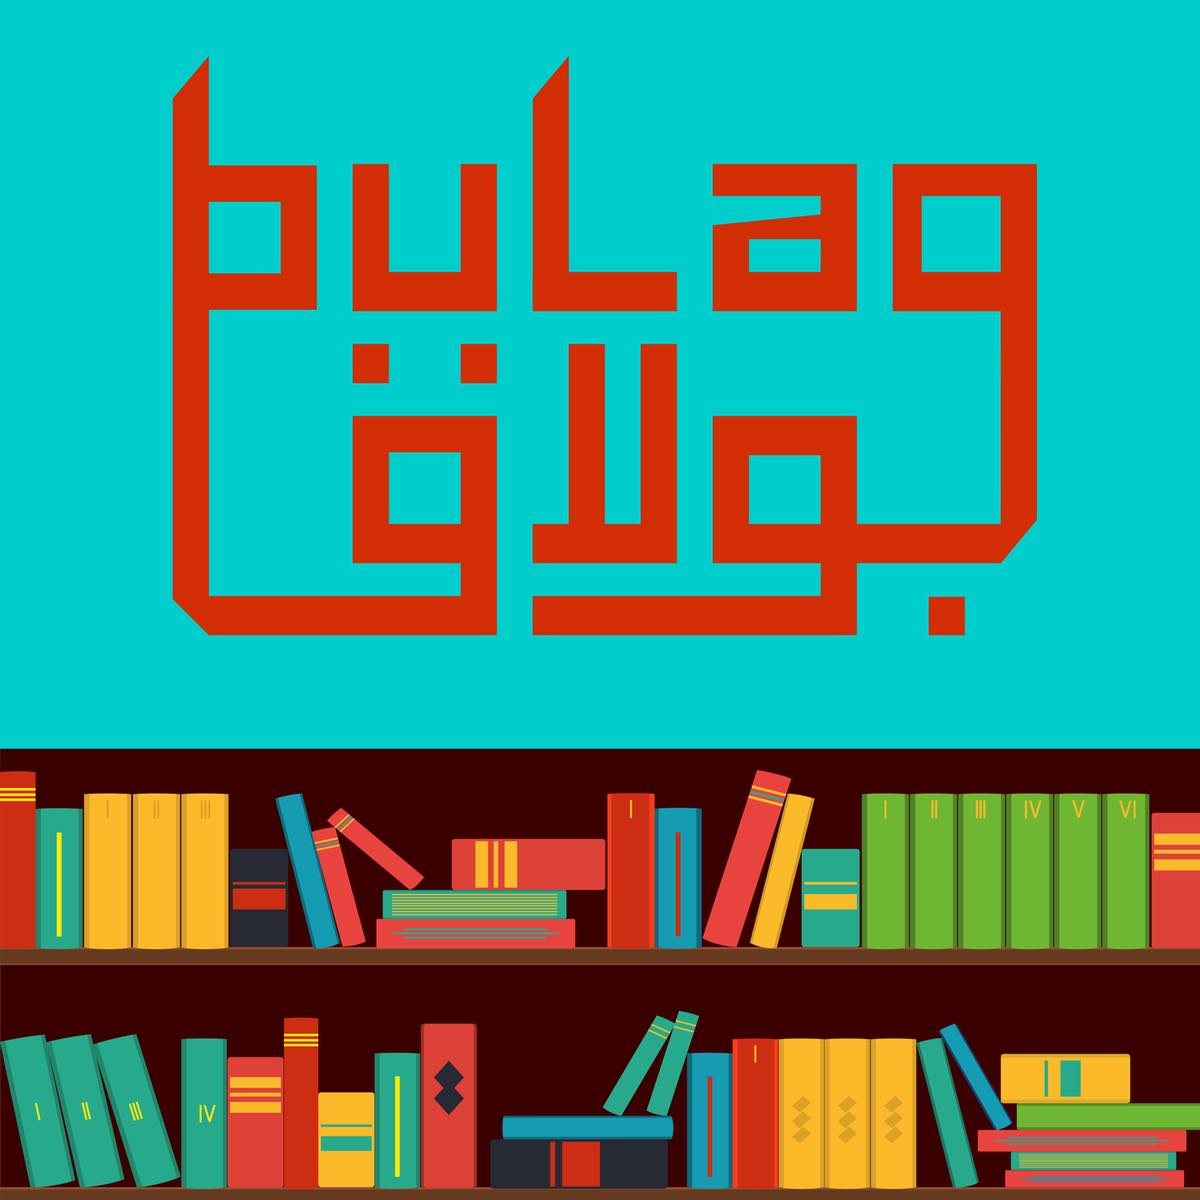 bulaq-burnt ornage on turq - lores.jpg